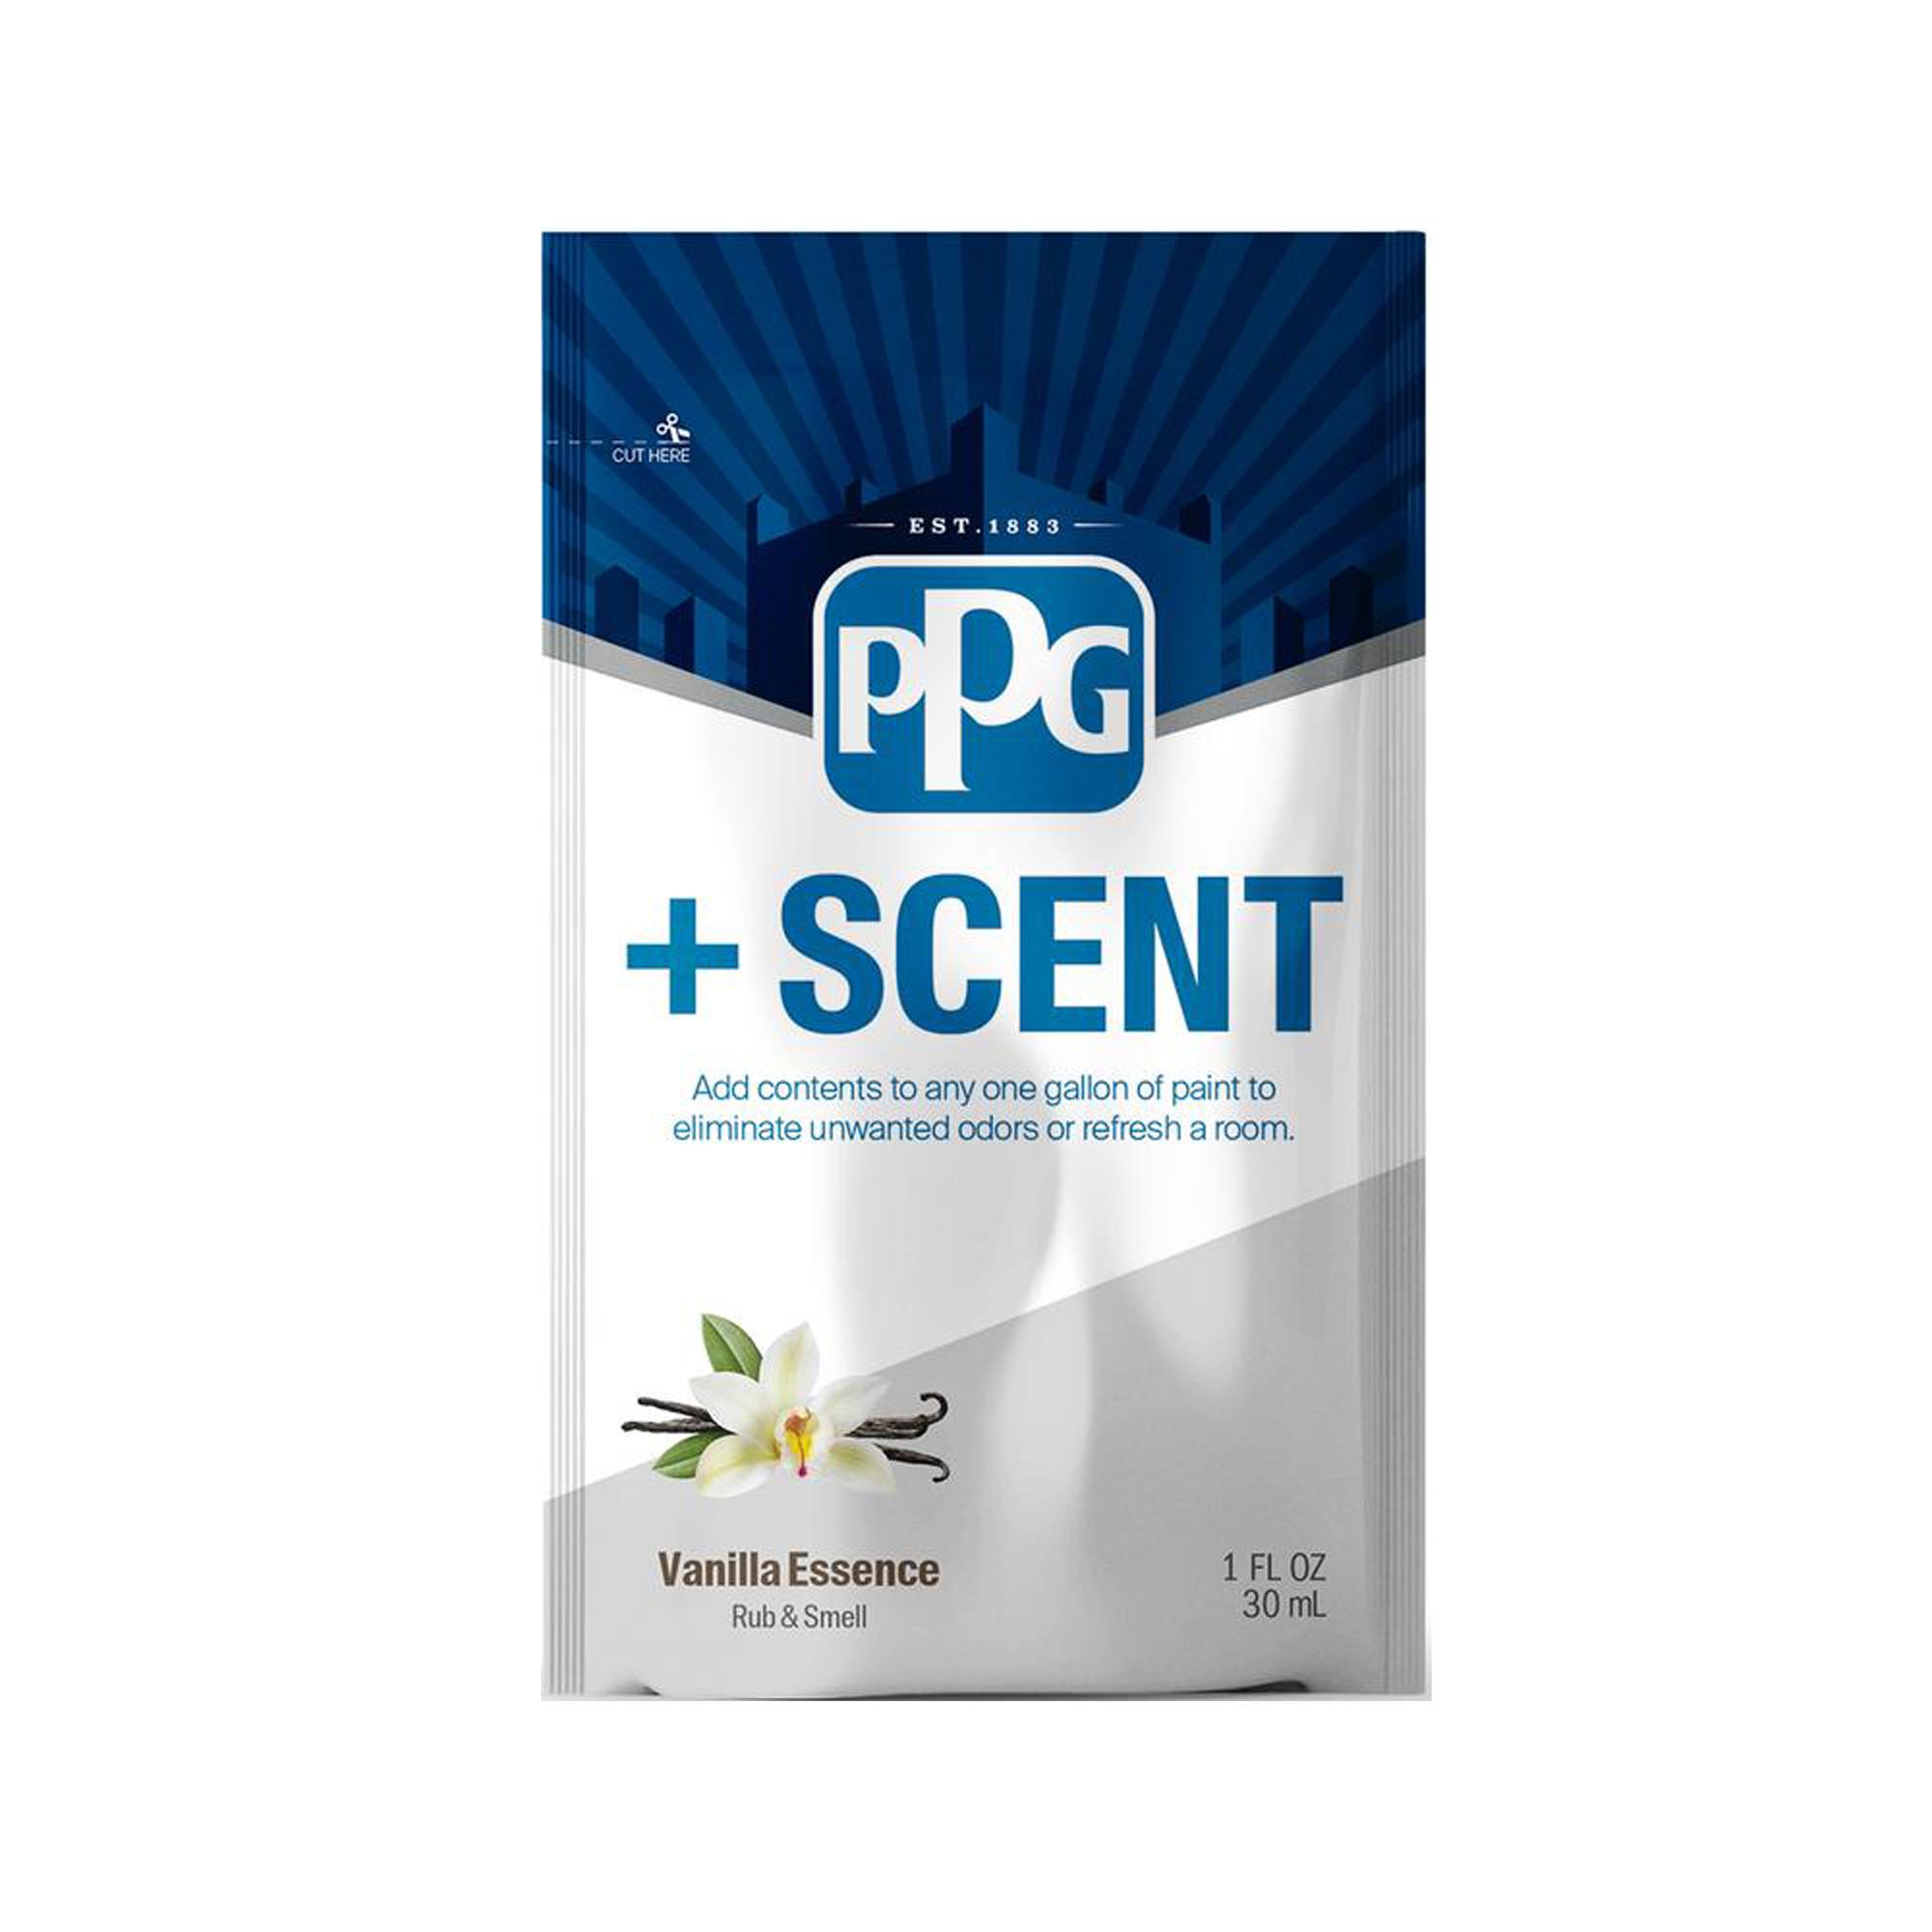 PPG +Scent Vanilla